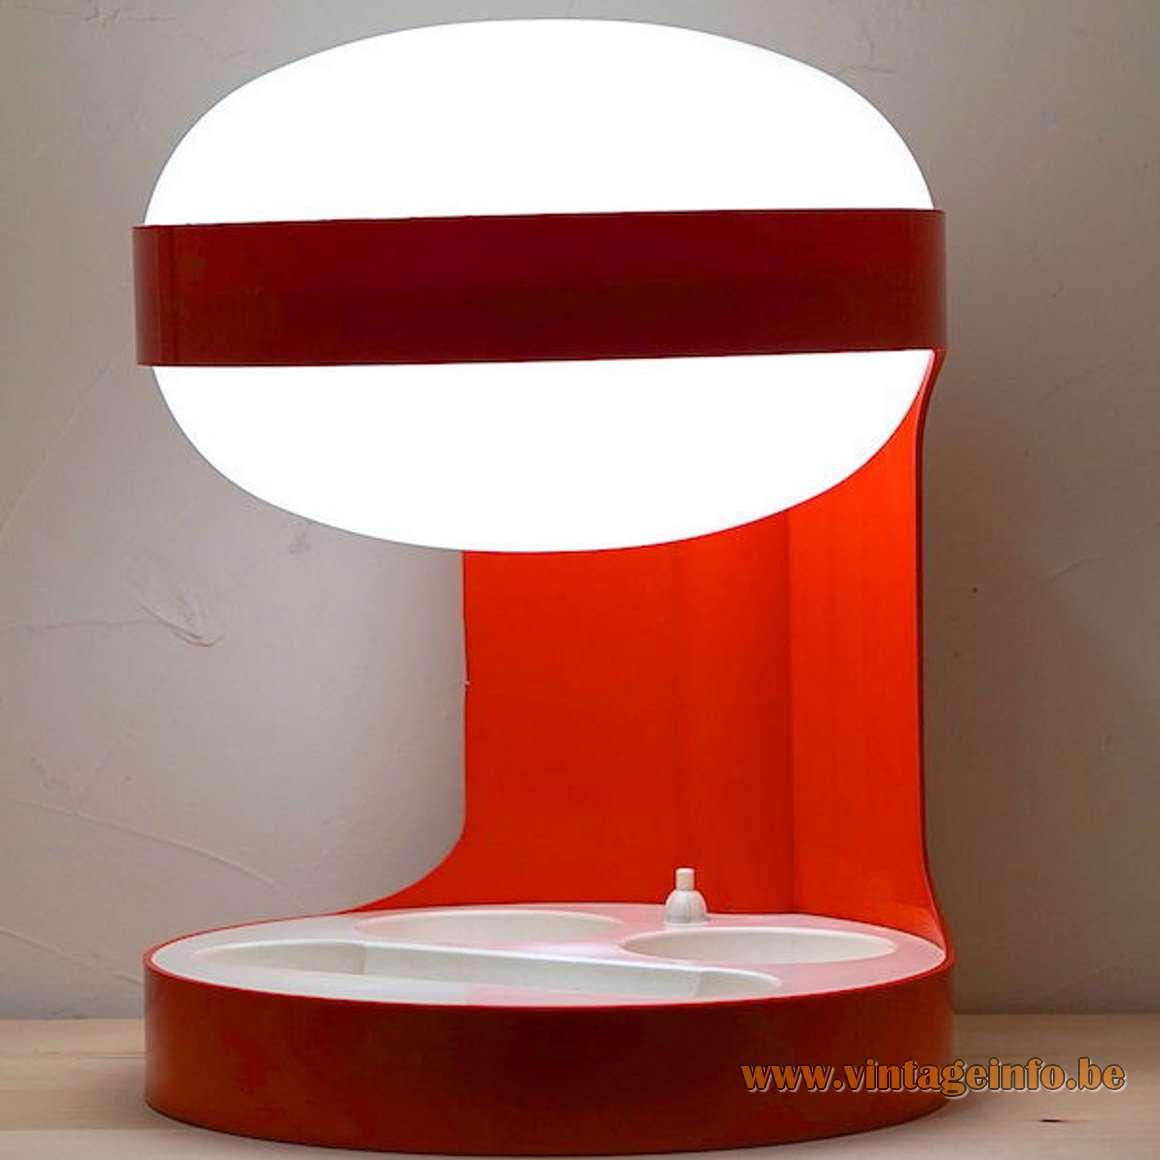 Joe Colombo KD 29 Table Lamp - red